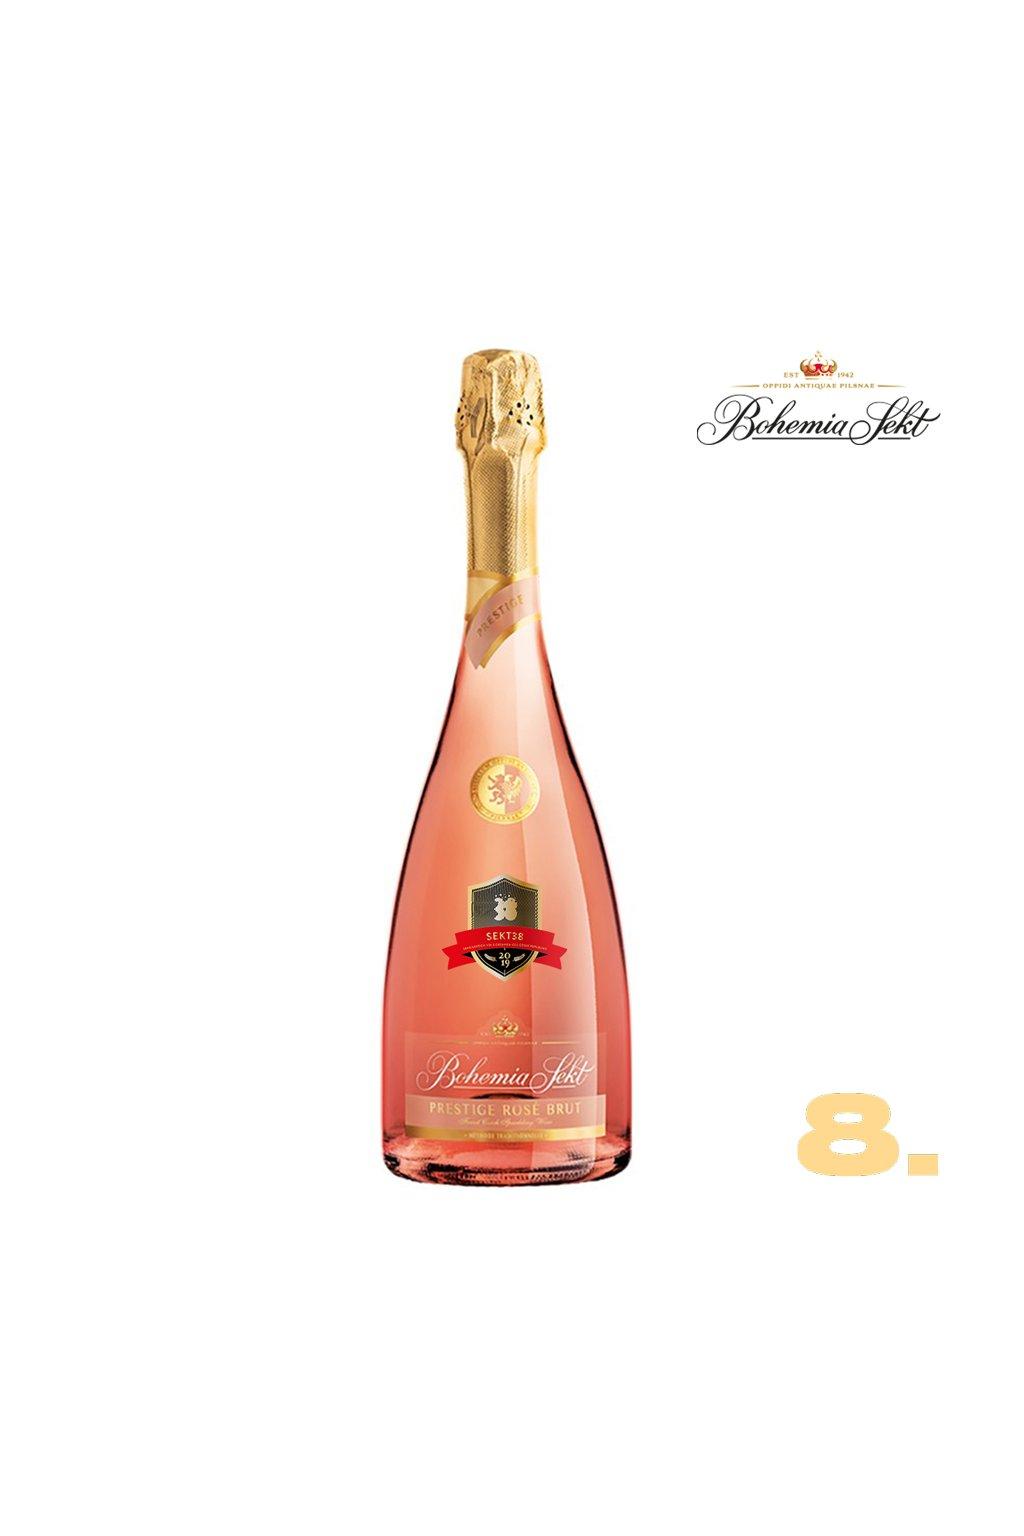 8 Bohemia Sekt Prestige rosé brut